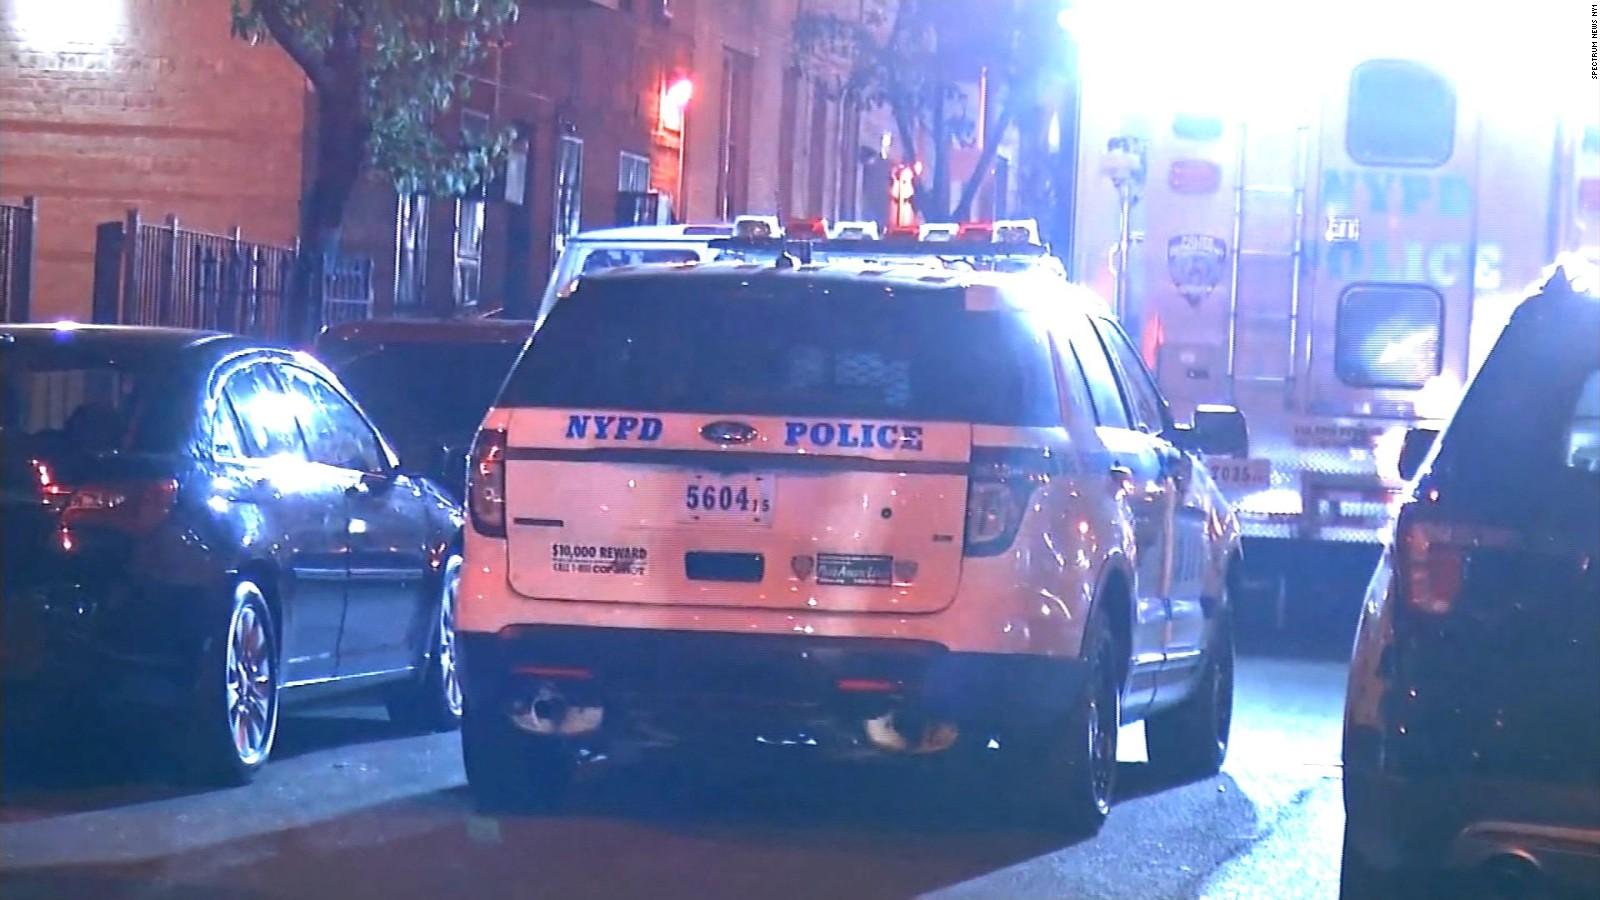 New York Police Officer Fatally Shot In Unprovoked Attack Cnn